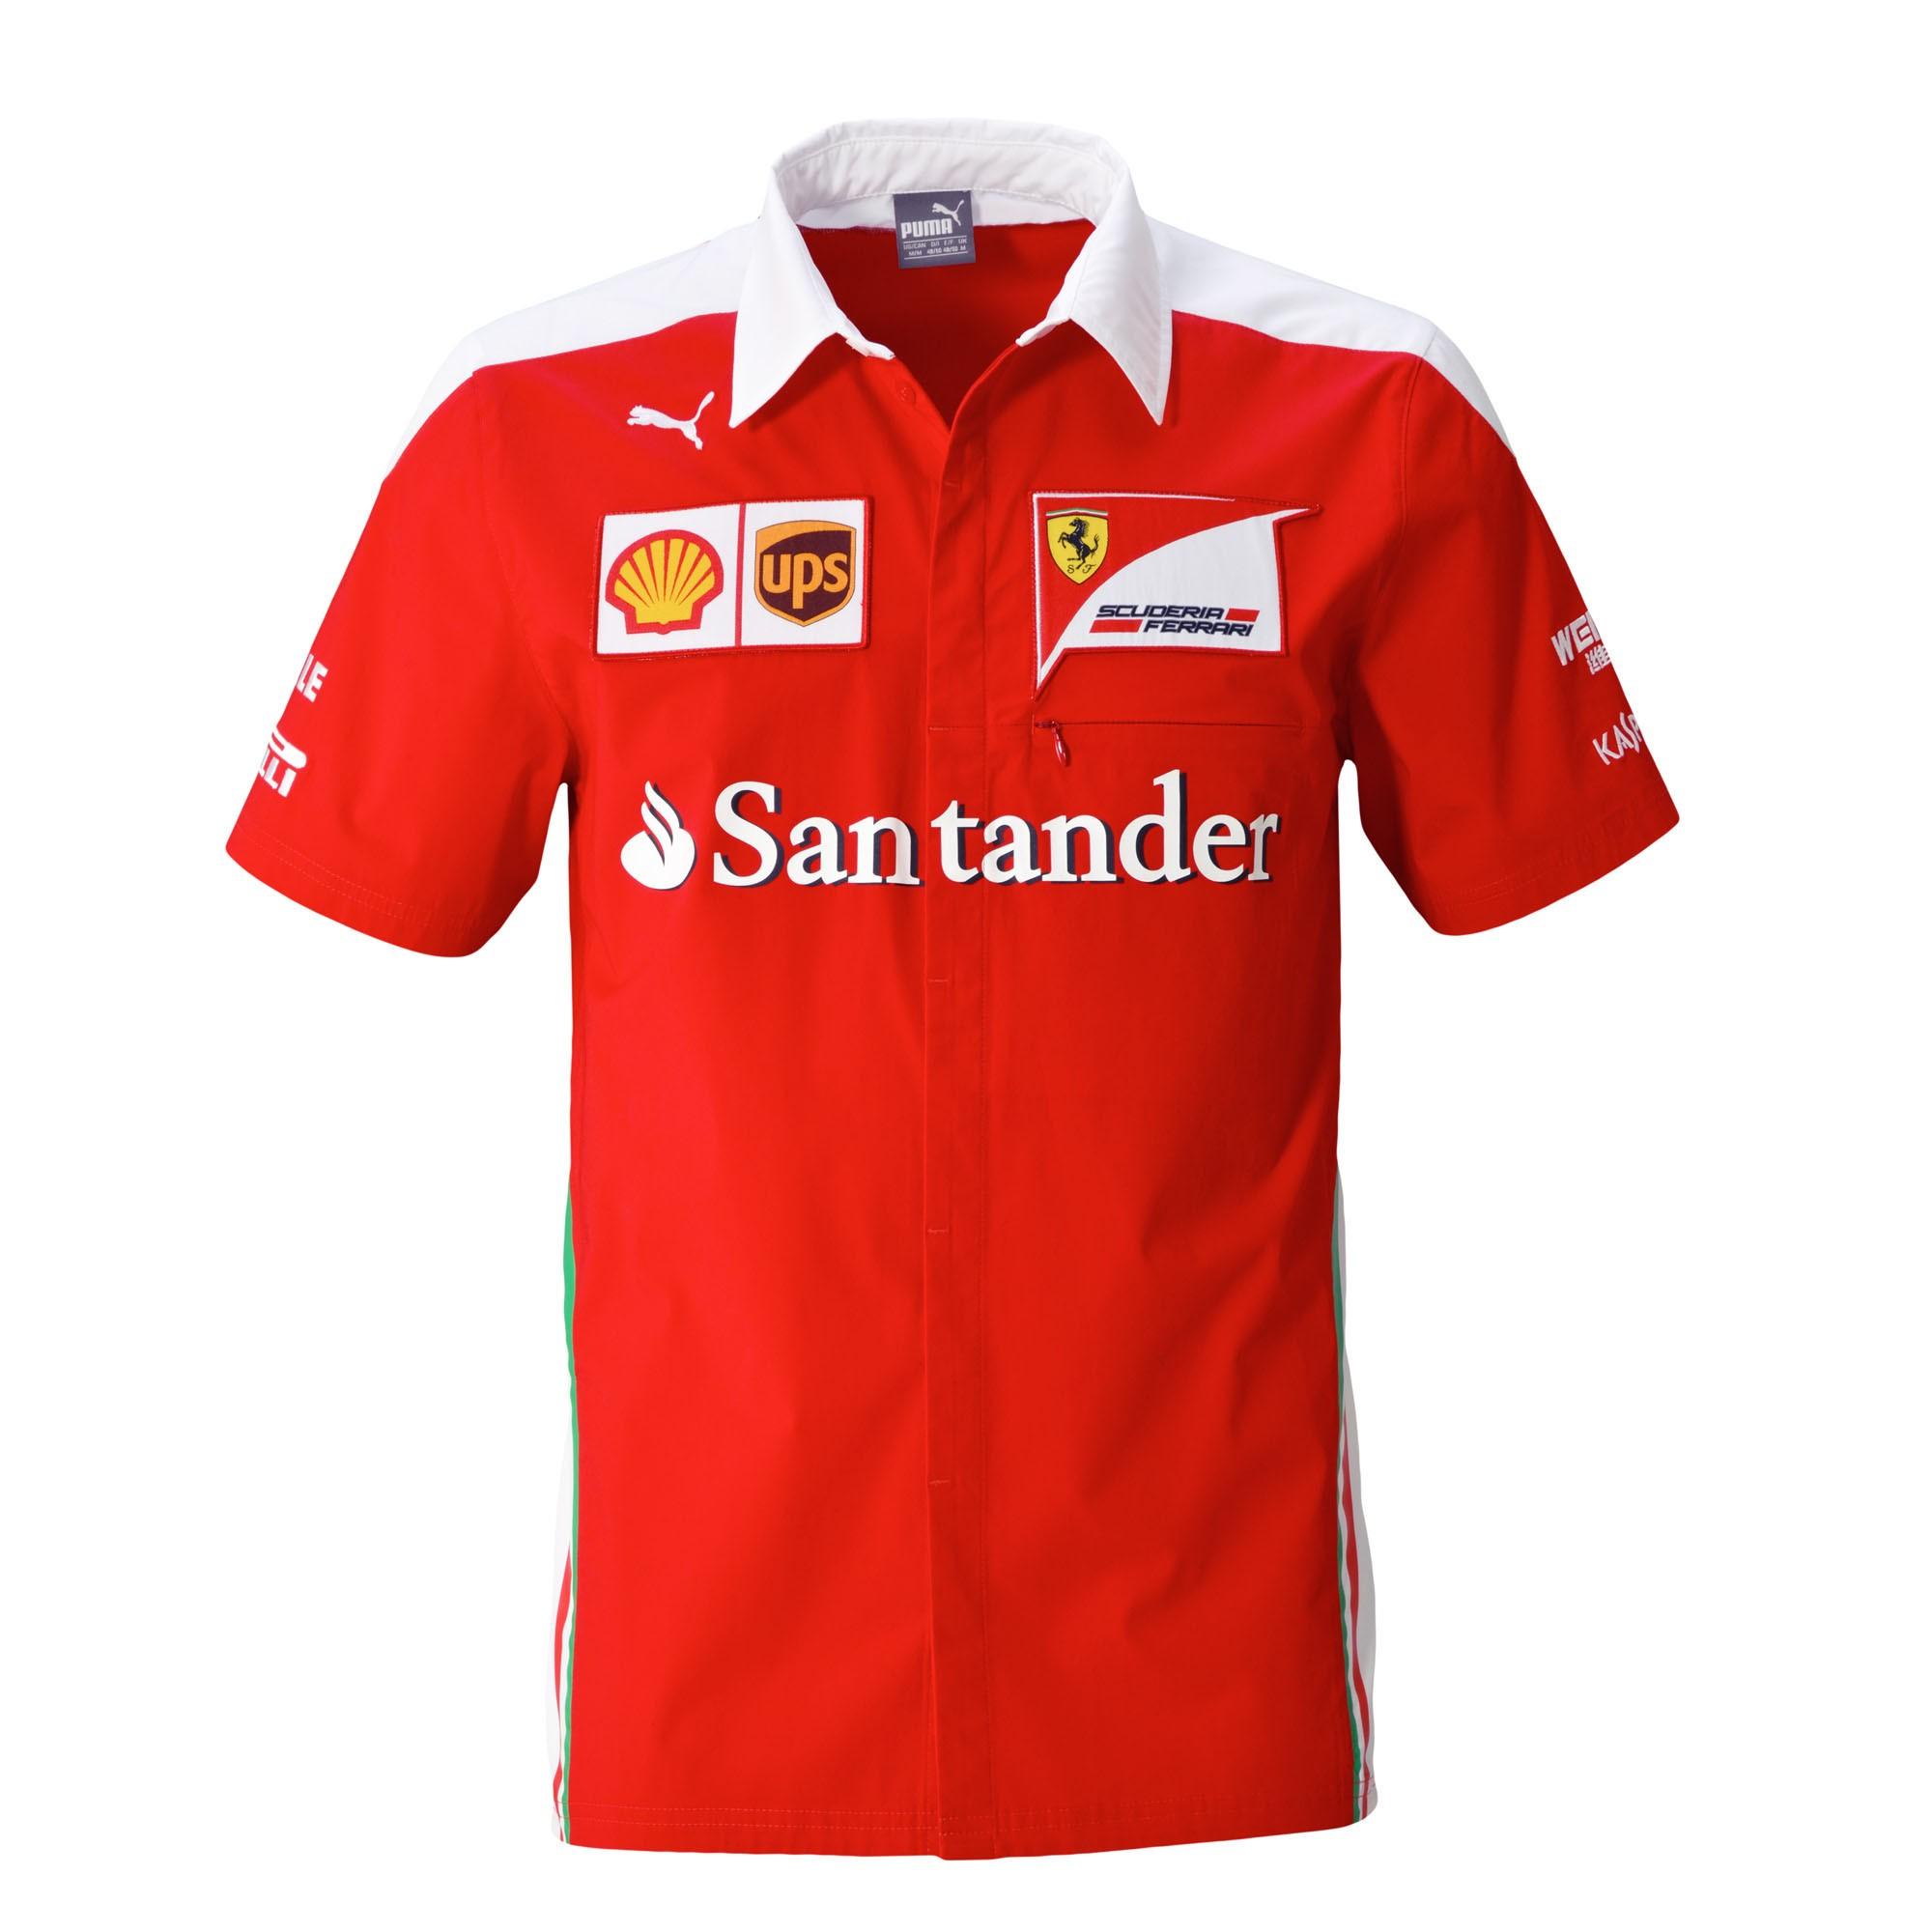 new 2016 ferrari formula one f1 mens sf team short sleeve red shirt sizes s xxl ebay. Black Bedroom Furniture Sets. Home Design Ideas